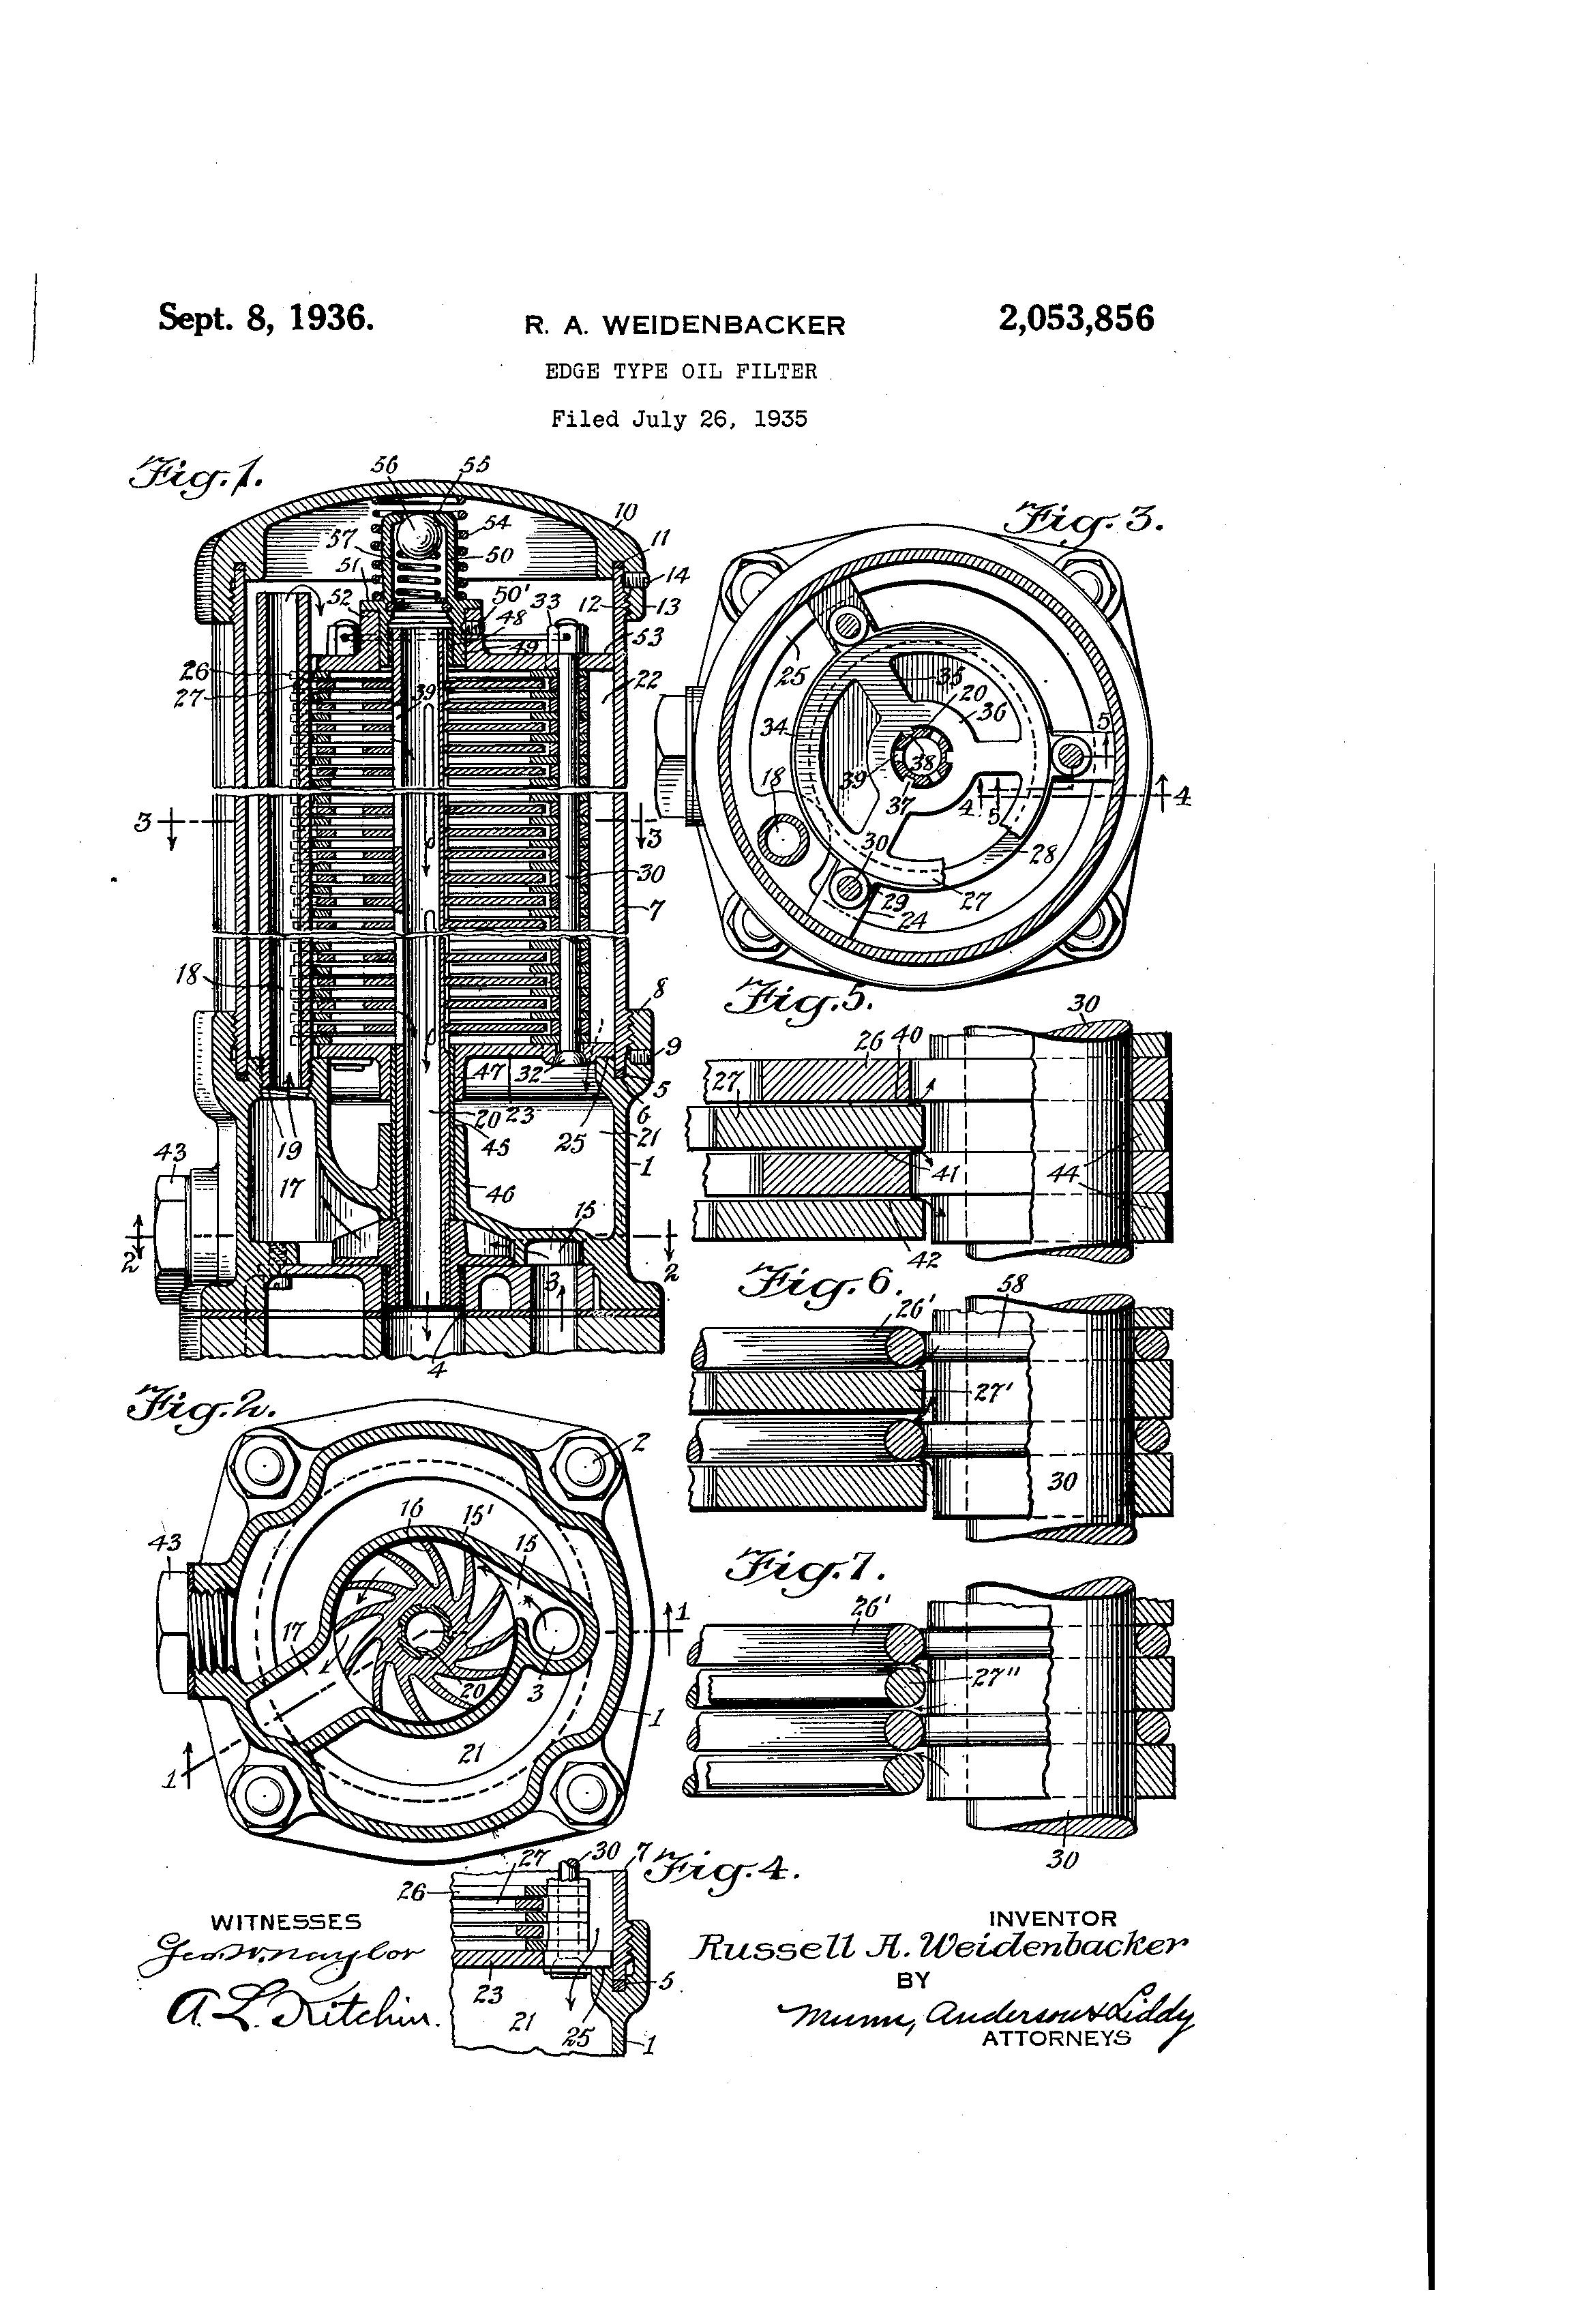 patent us2053856 - edge type oil filter